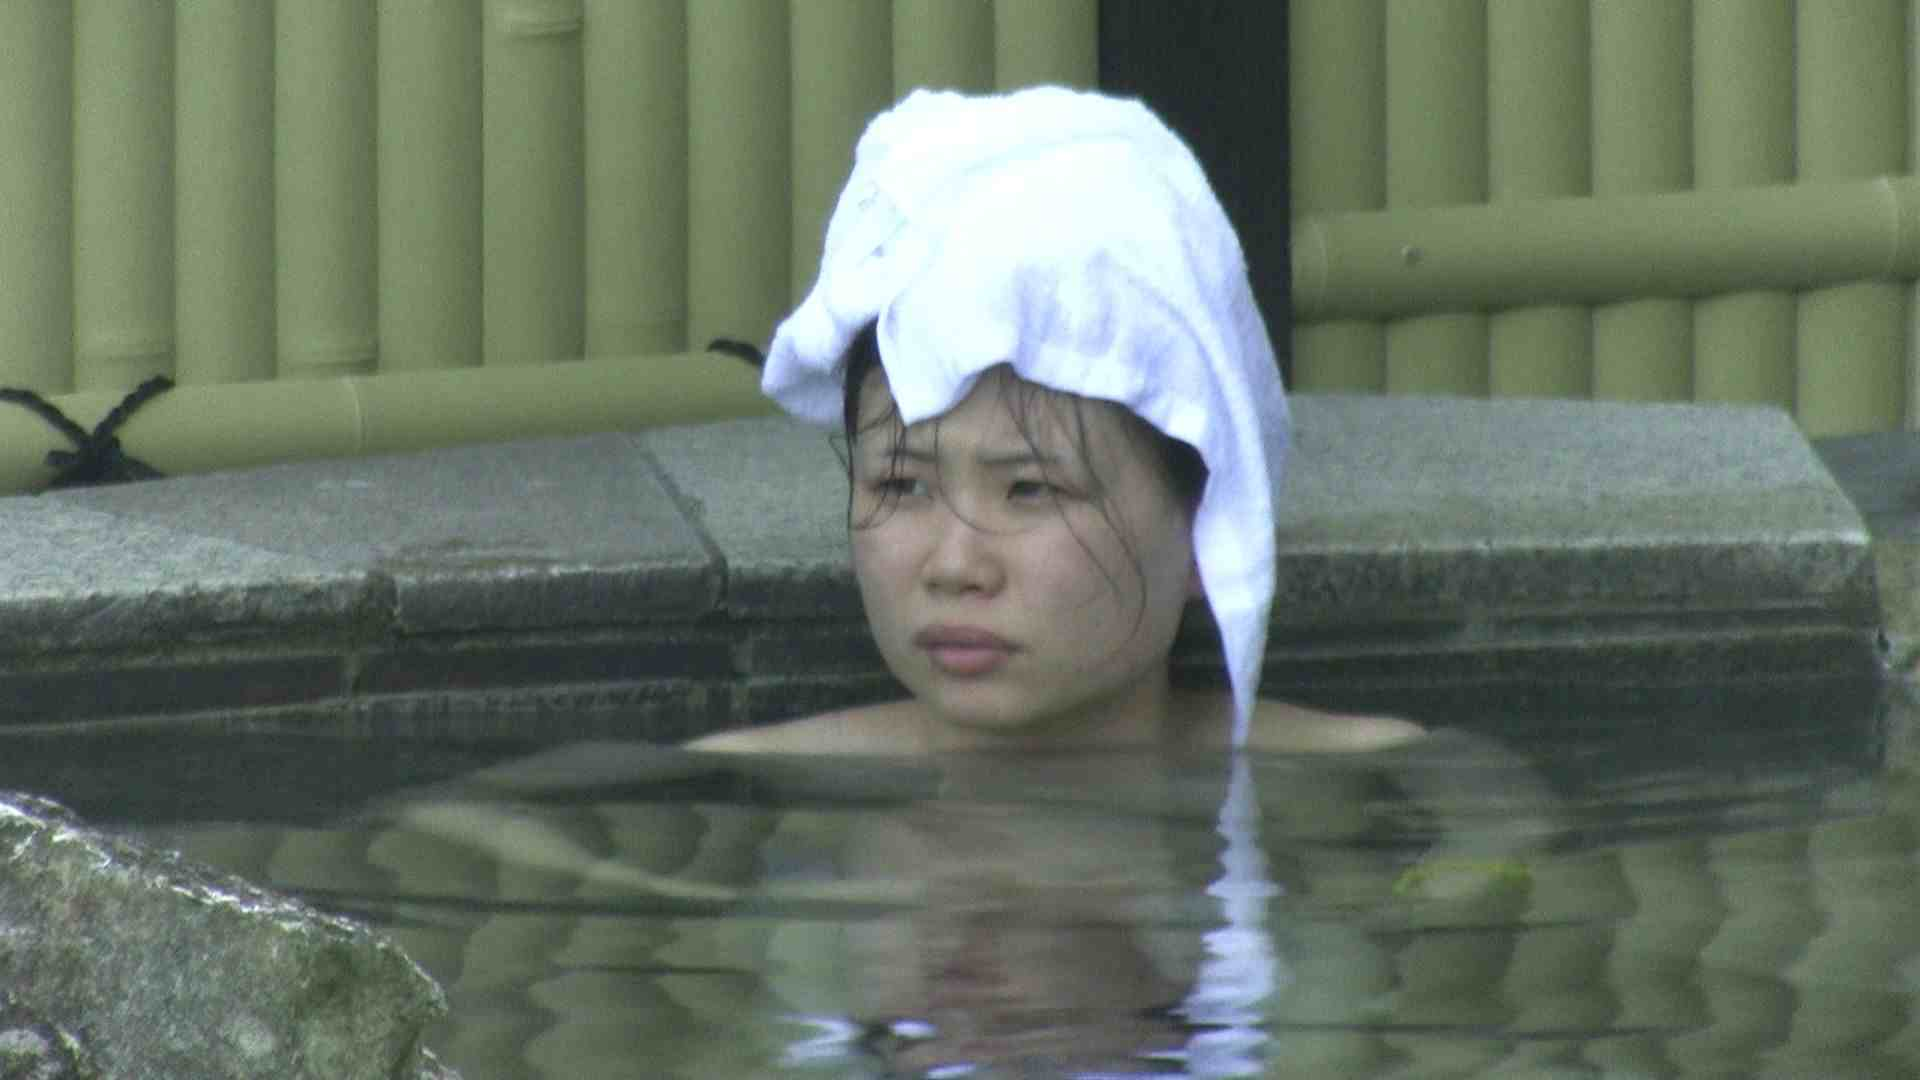 Aquaな露天風呂Vol.183 盗撮 | OLセックス  69画像 58